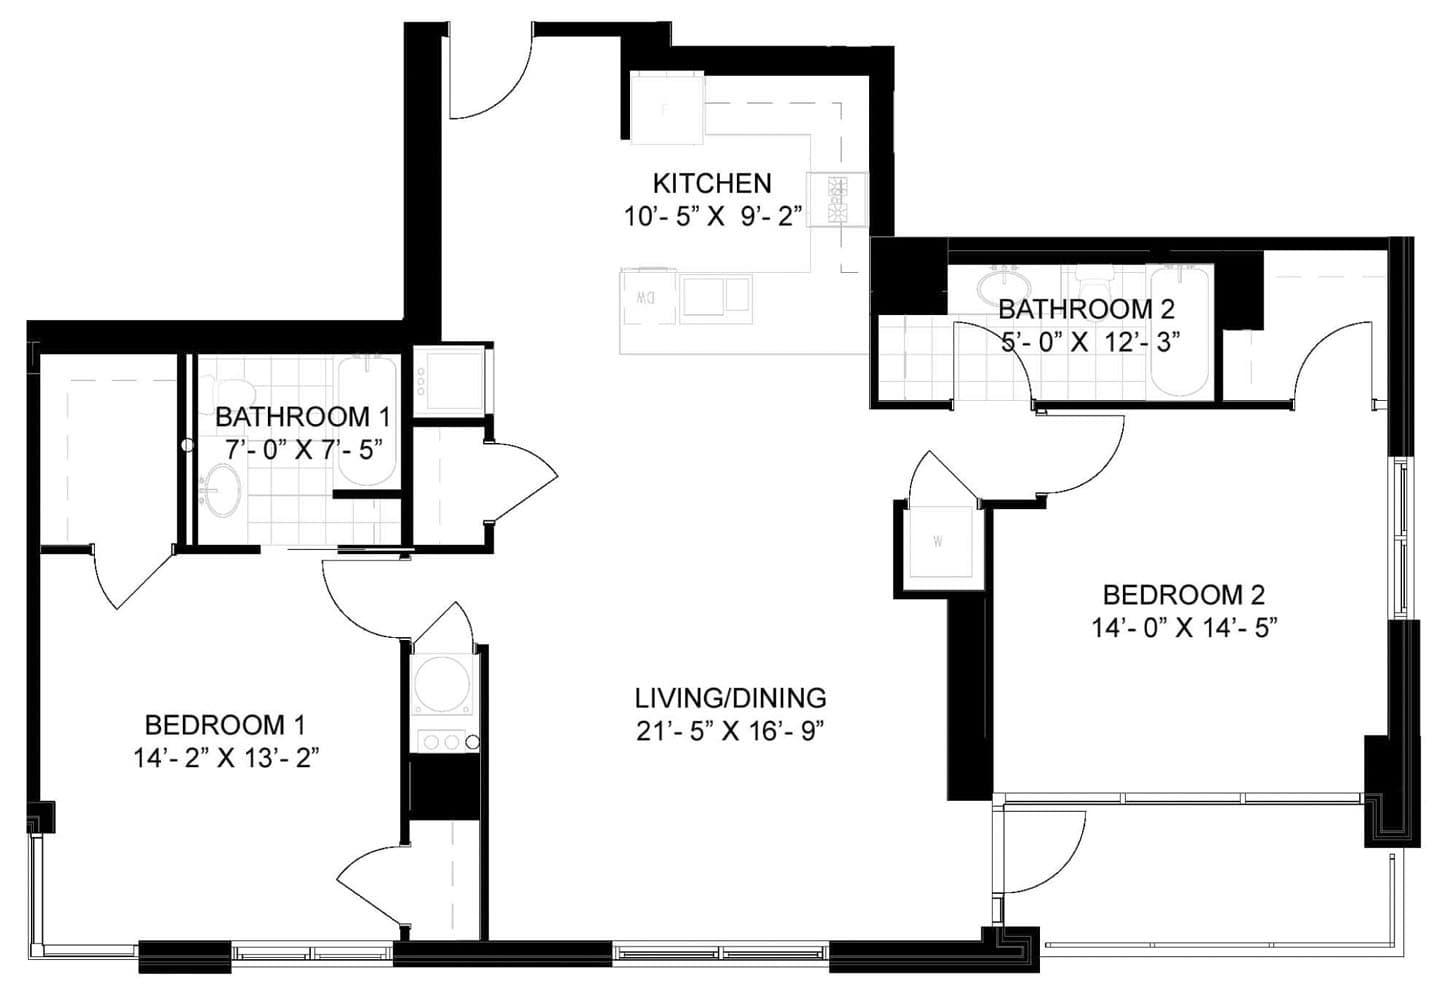 View Lakehouse Apartment Floor Plans Studios 1 2 3 Bedrooms Bozzuto